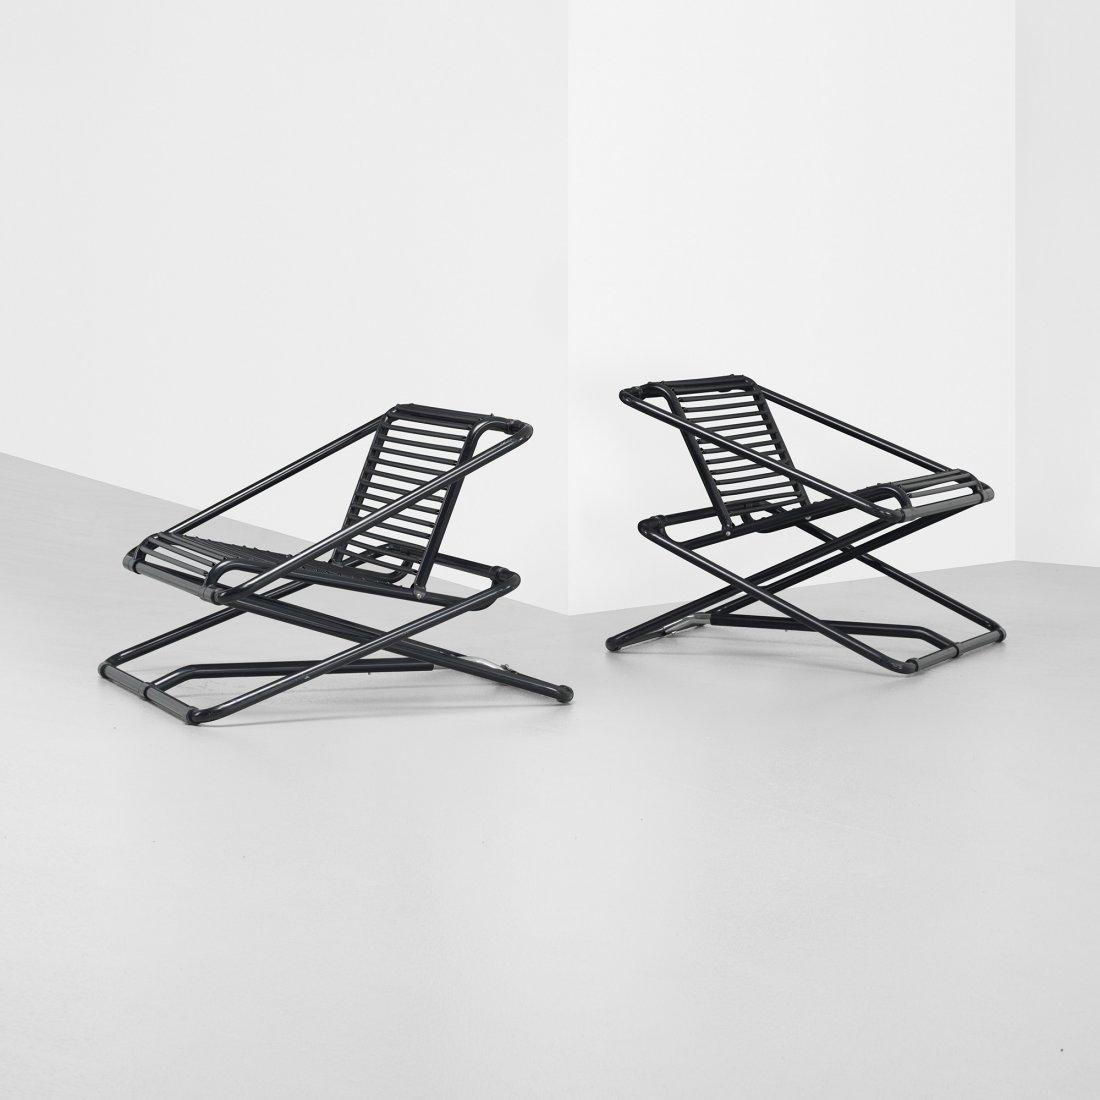 108: Ron Arad Rocking Chairs, pair